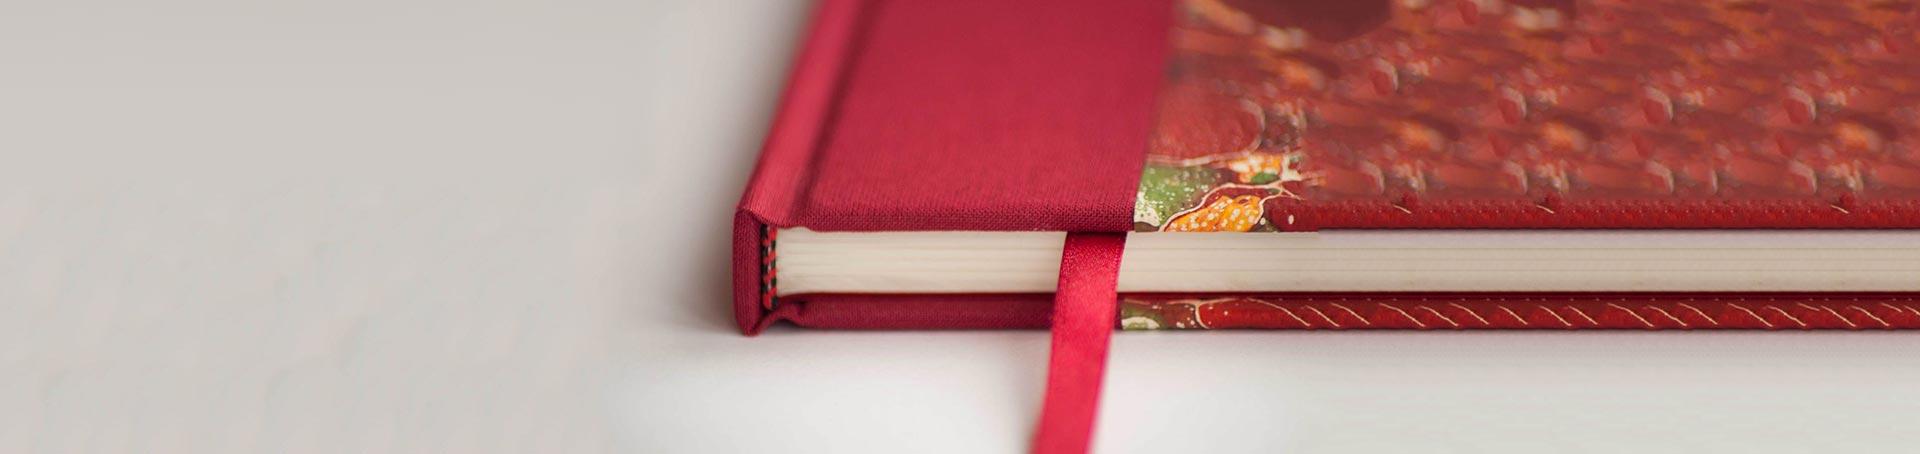 livre d'or openelement